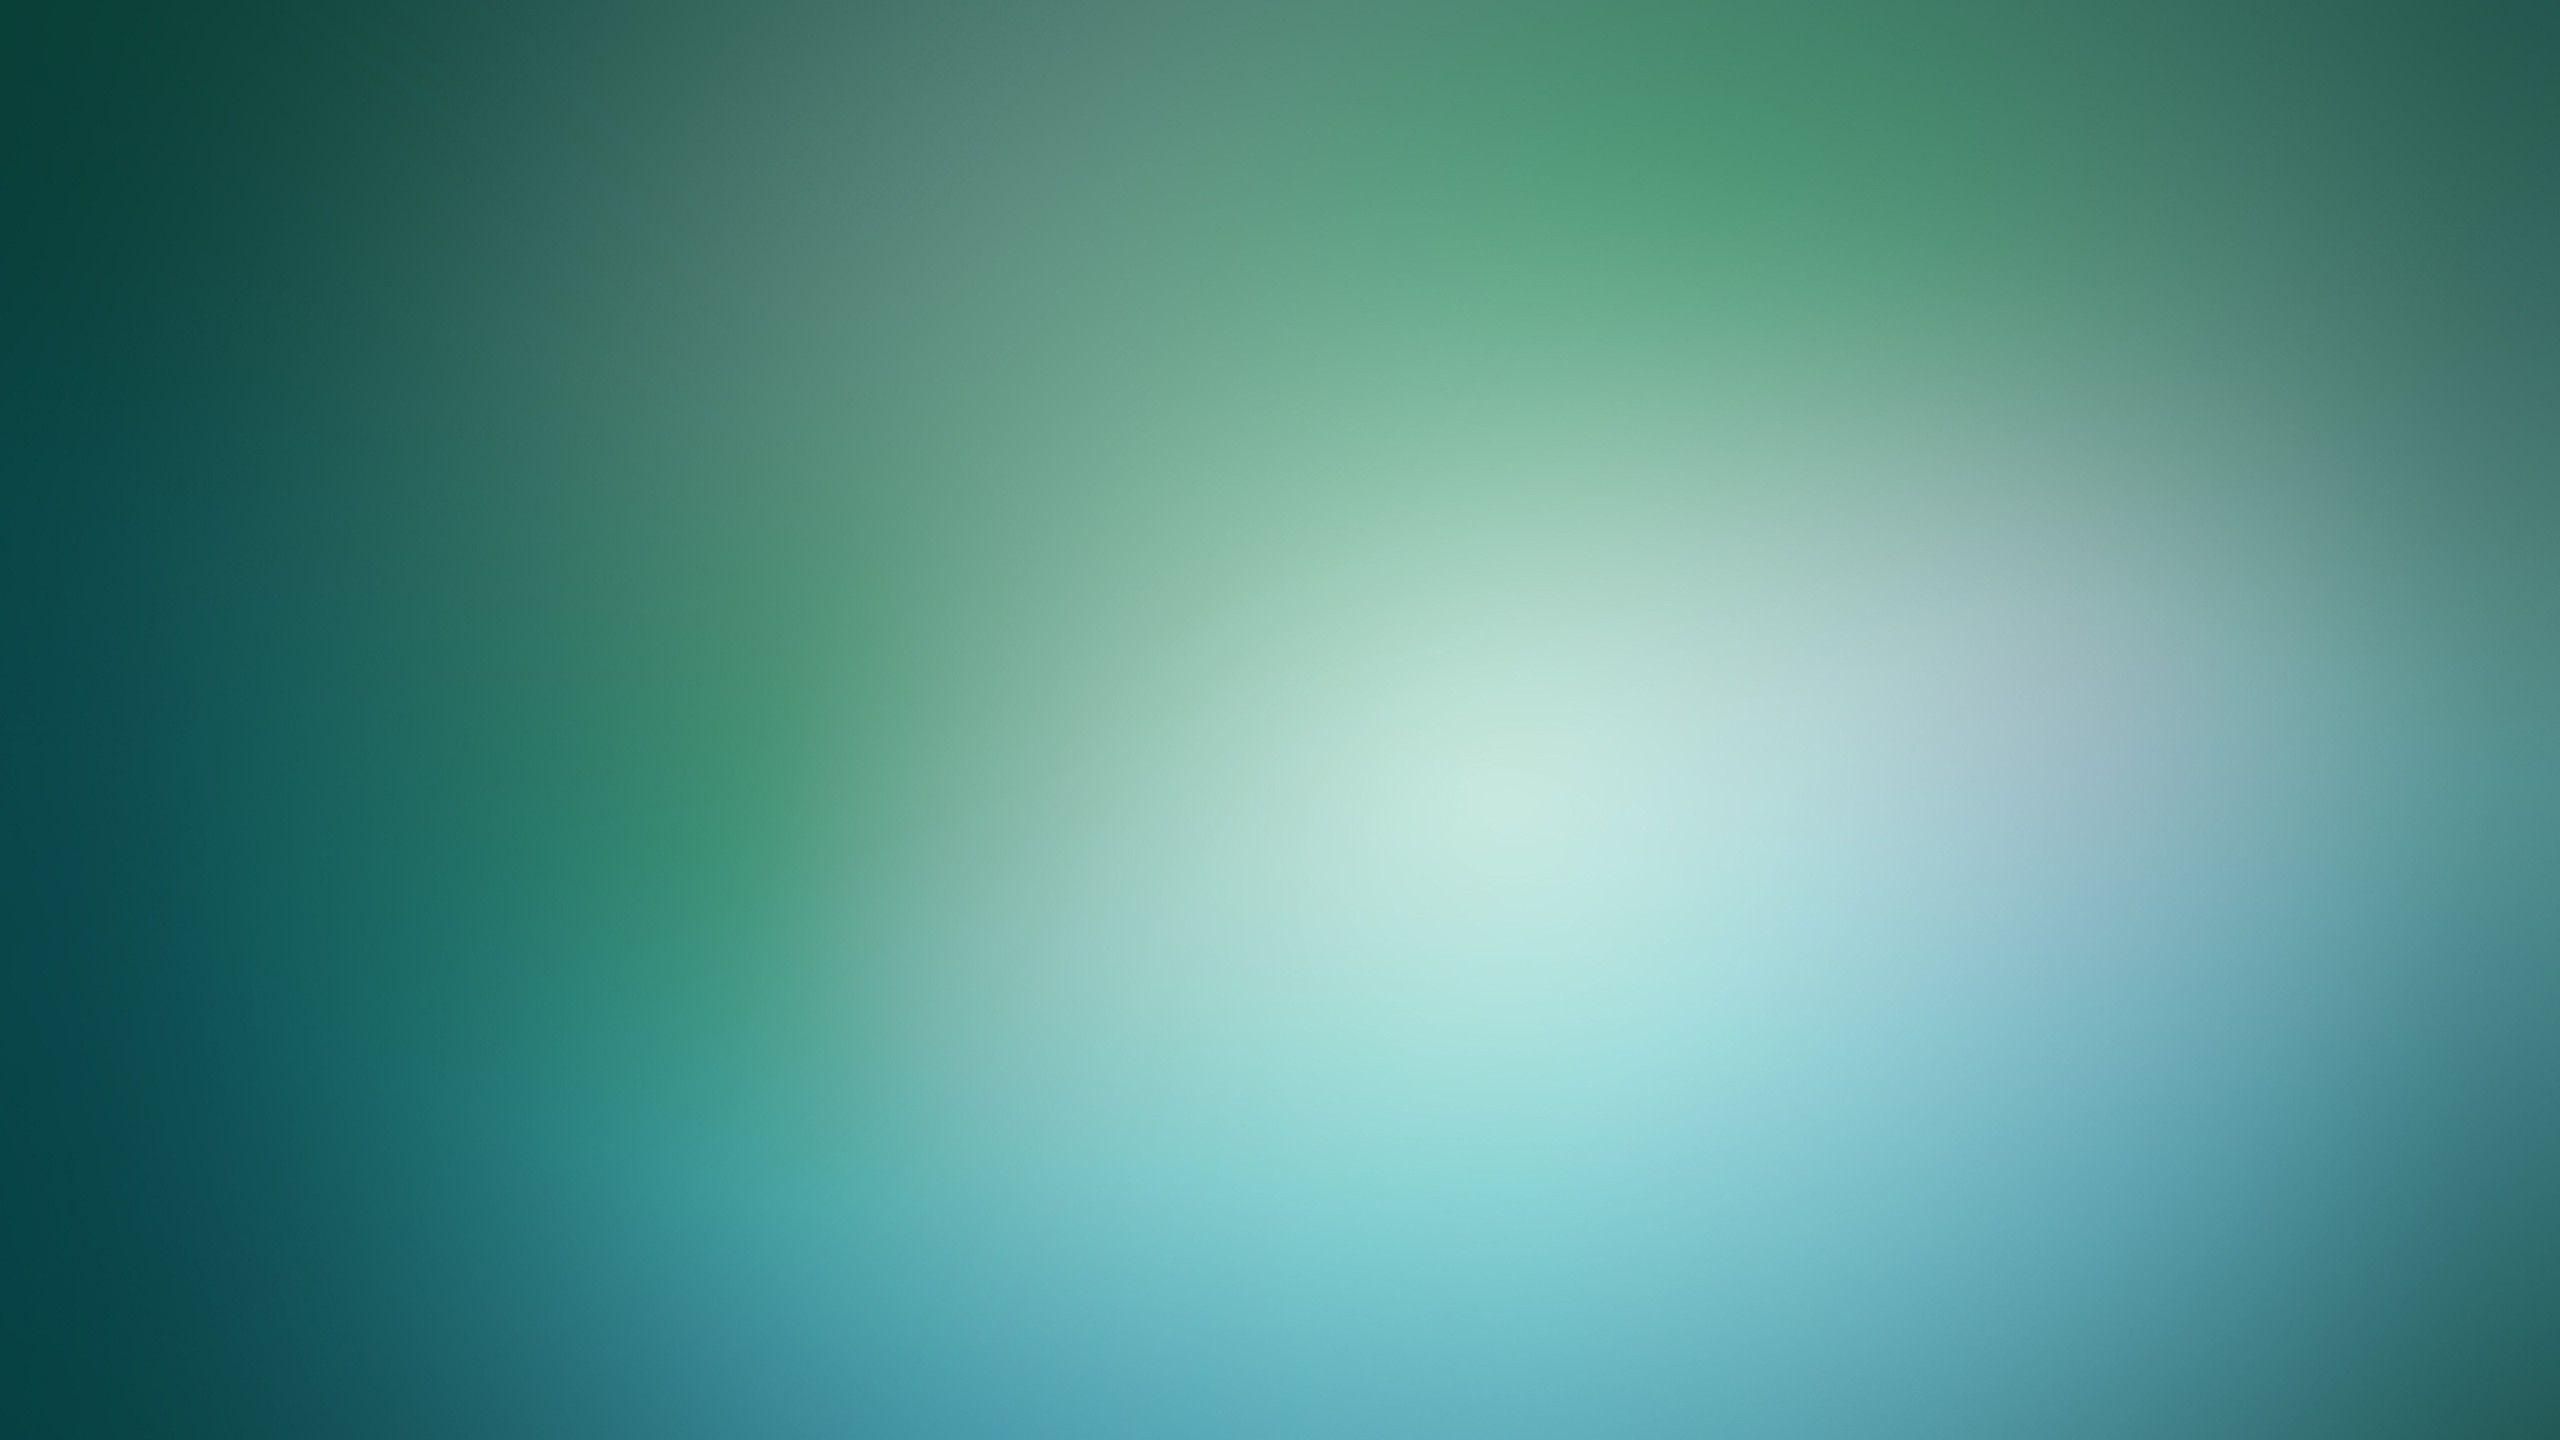 Res: 2560x1440, Mac iMac 27 Solid Wallpapers HD, Desktop Backgrounds